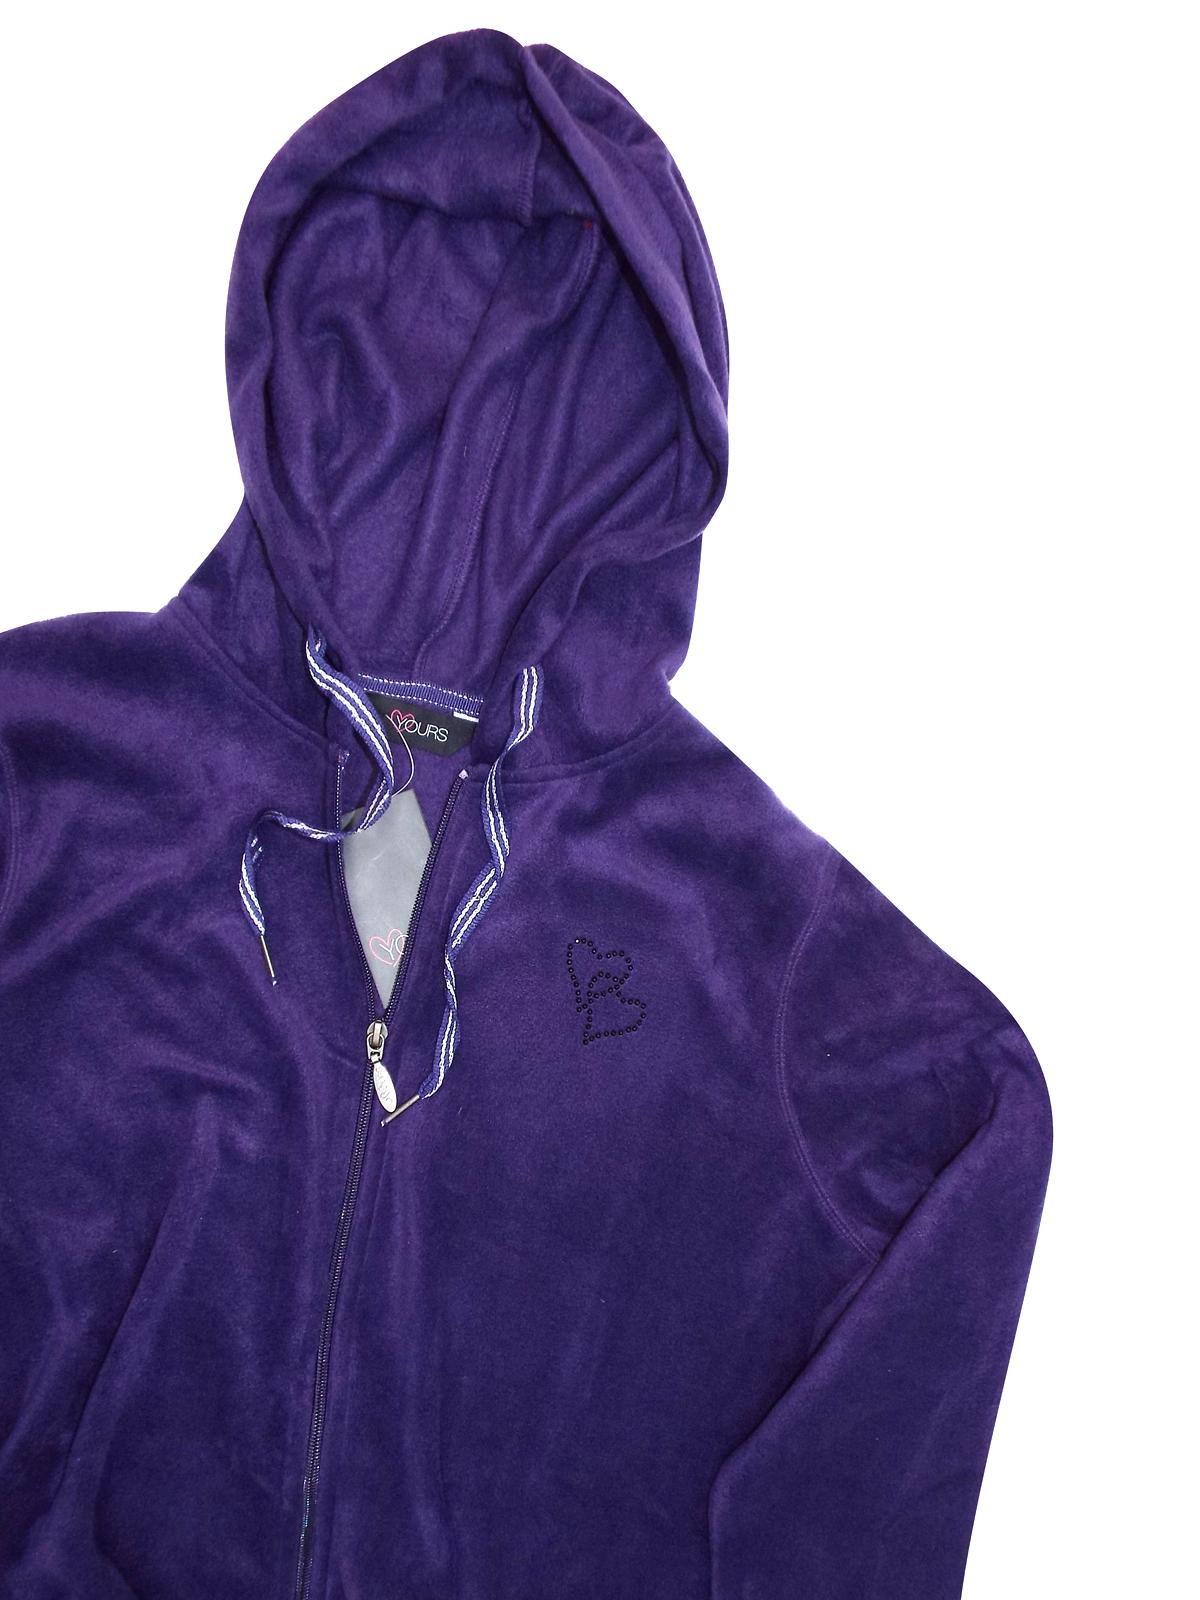 5812e0fe064 Yours PURPLE Double Heart Black Embellished Hooded Fleece Jacket ...